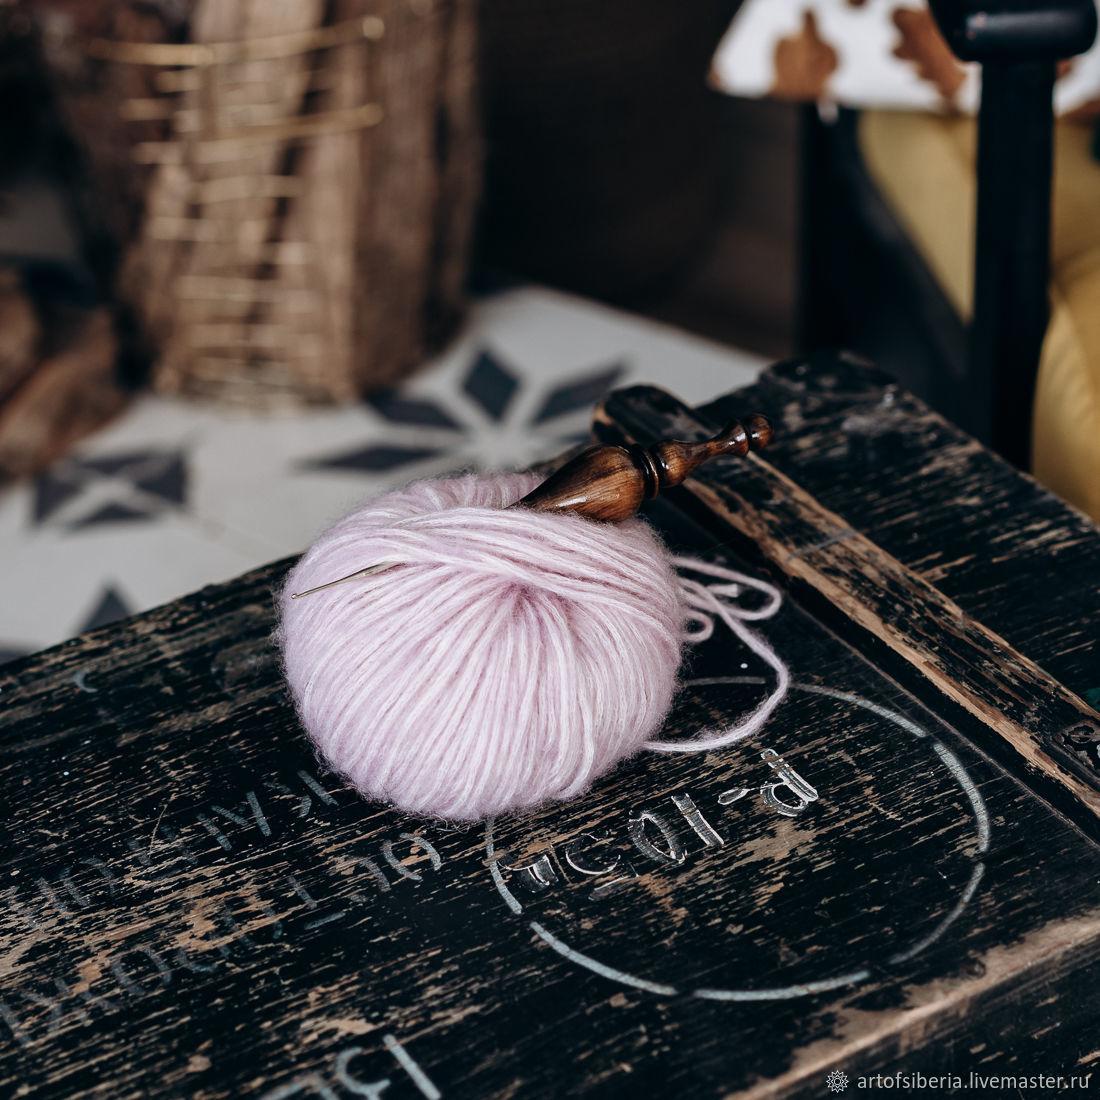 0,8 mm iron crochet hook with wooden handle (cedar) K215, Crochet Hooks, Novokuznetsk,  Фото №1